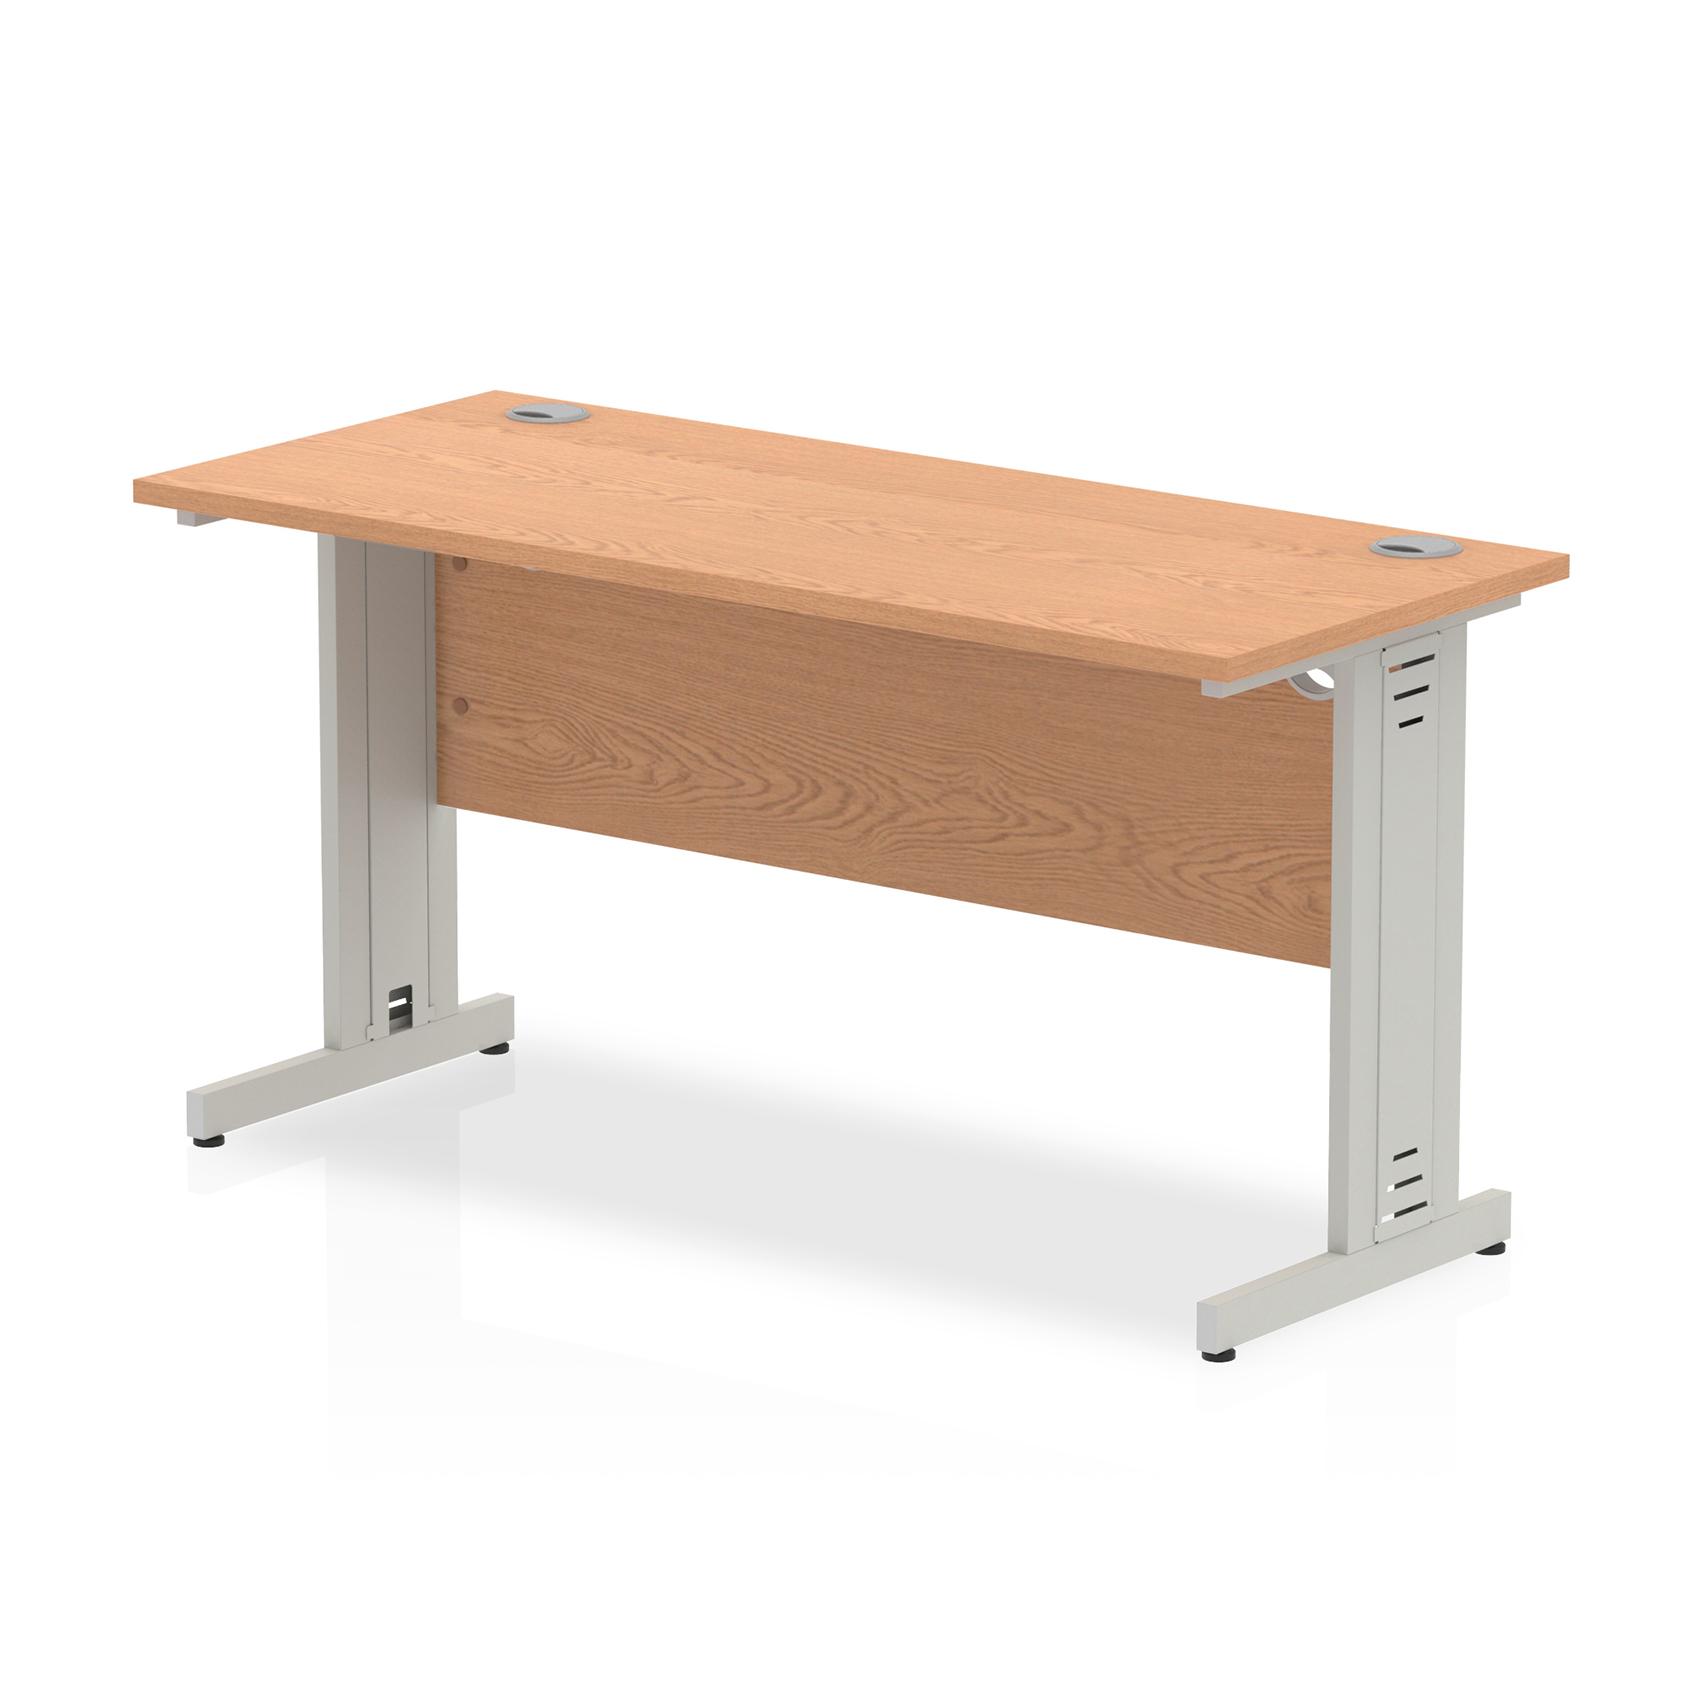 Trexus Desk Rectangle Cable Managed Silver Leg 1400x600mm Oak Ref MI002729